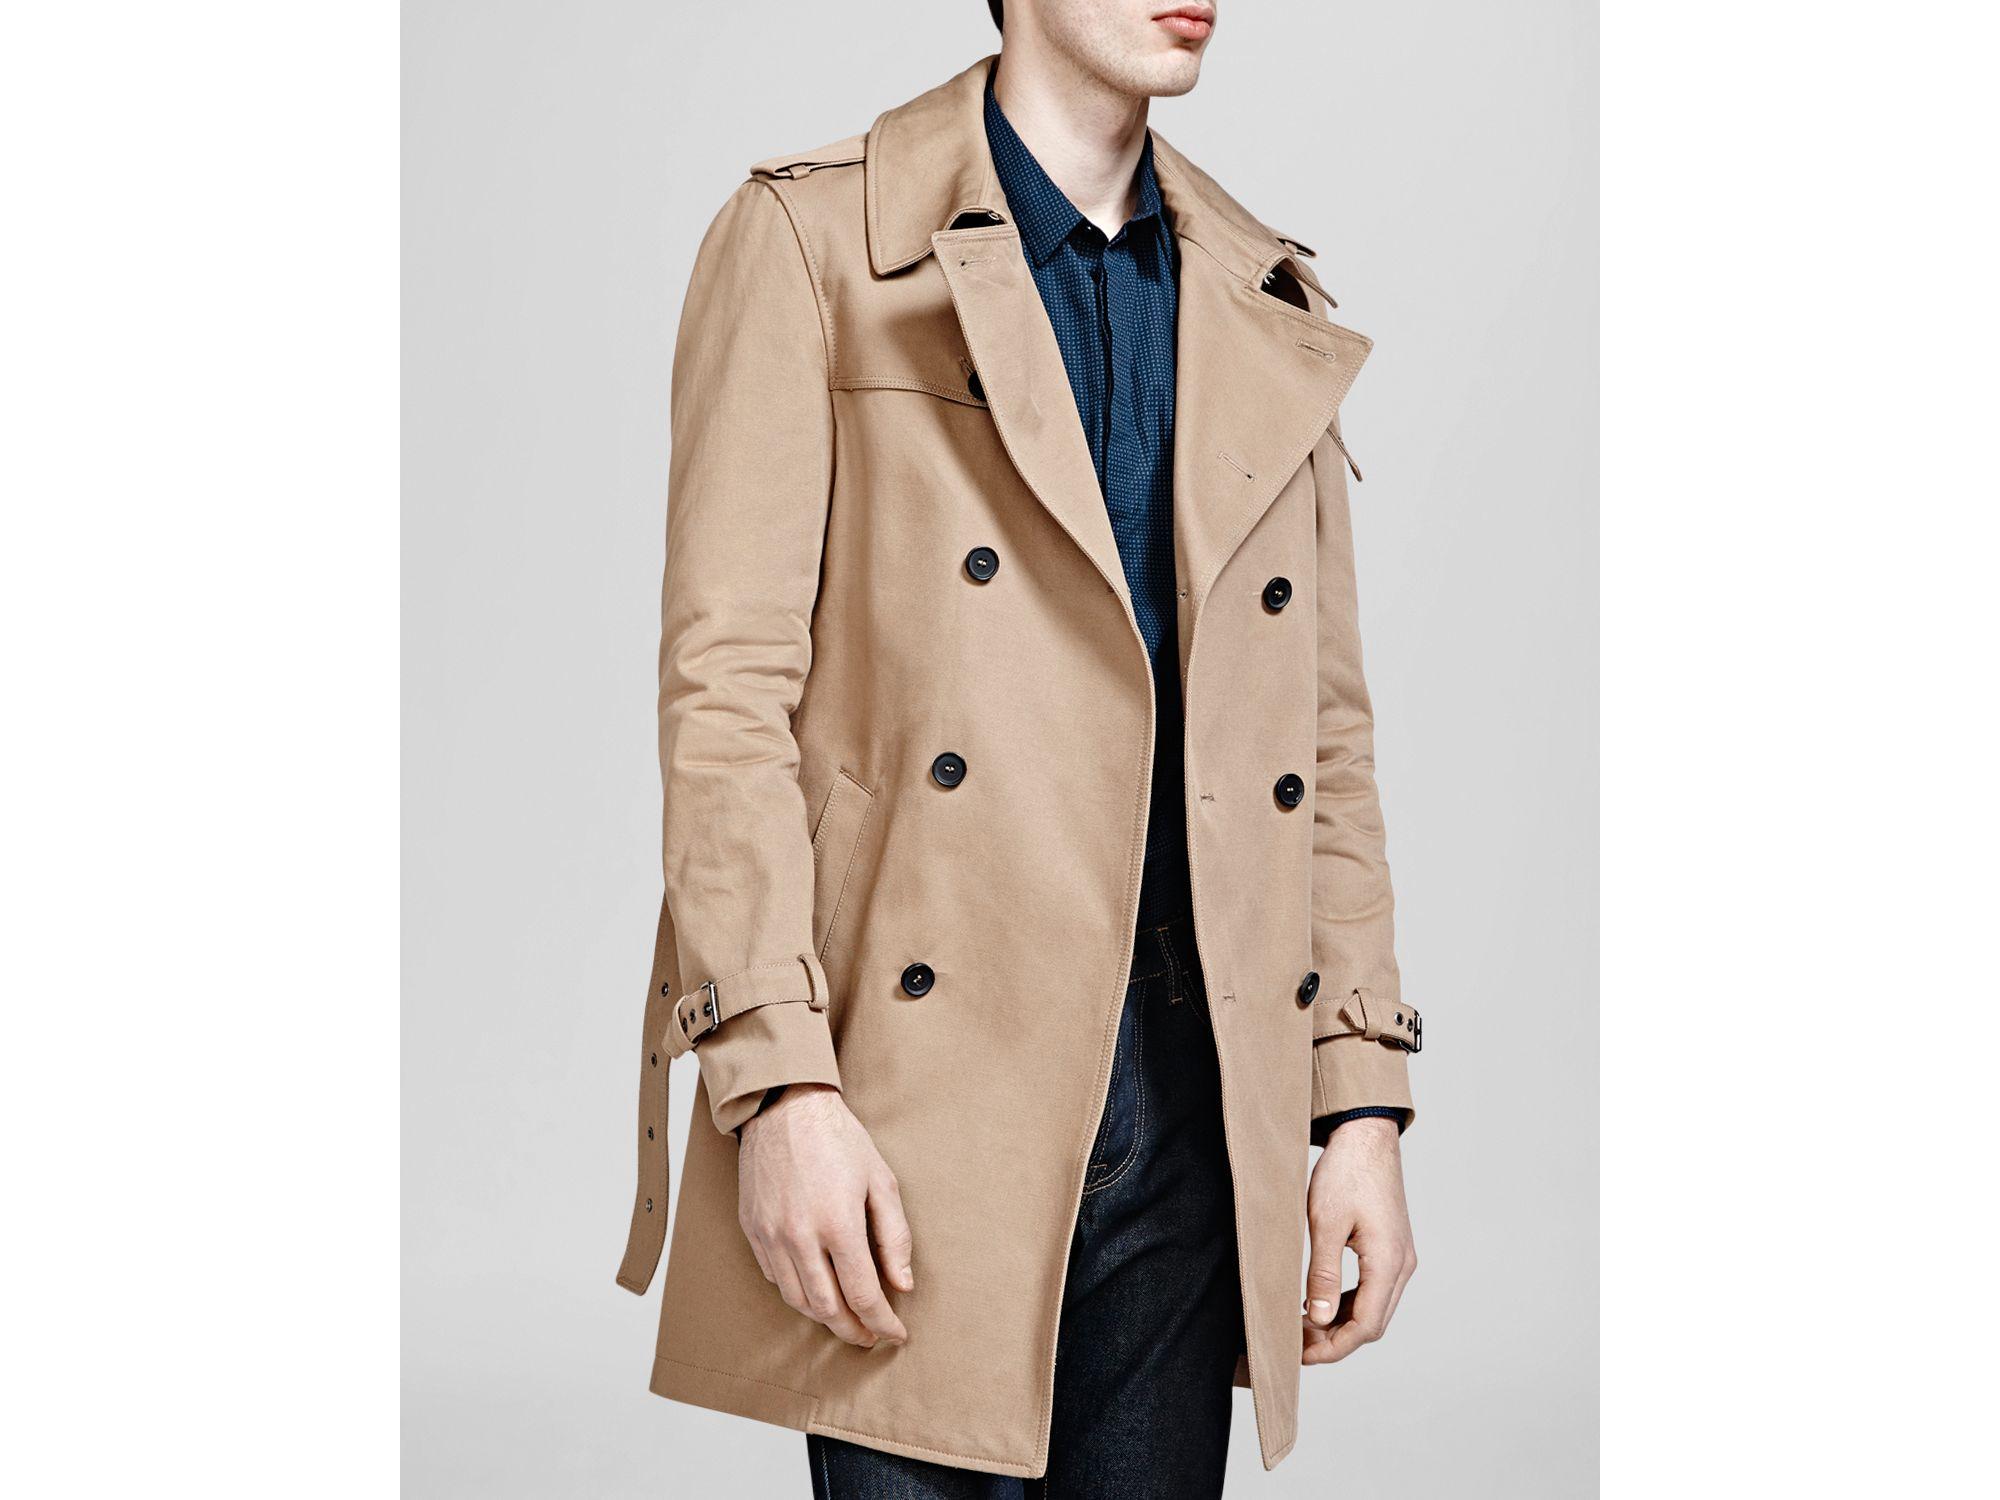 Kooples Trench For Lyst Gabardine In Coat Twill The Men Natural 5qxIR